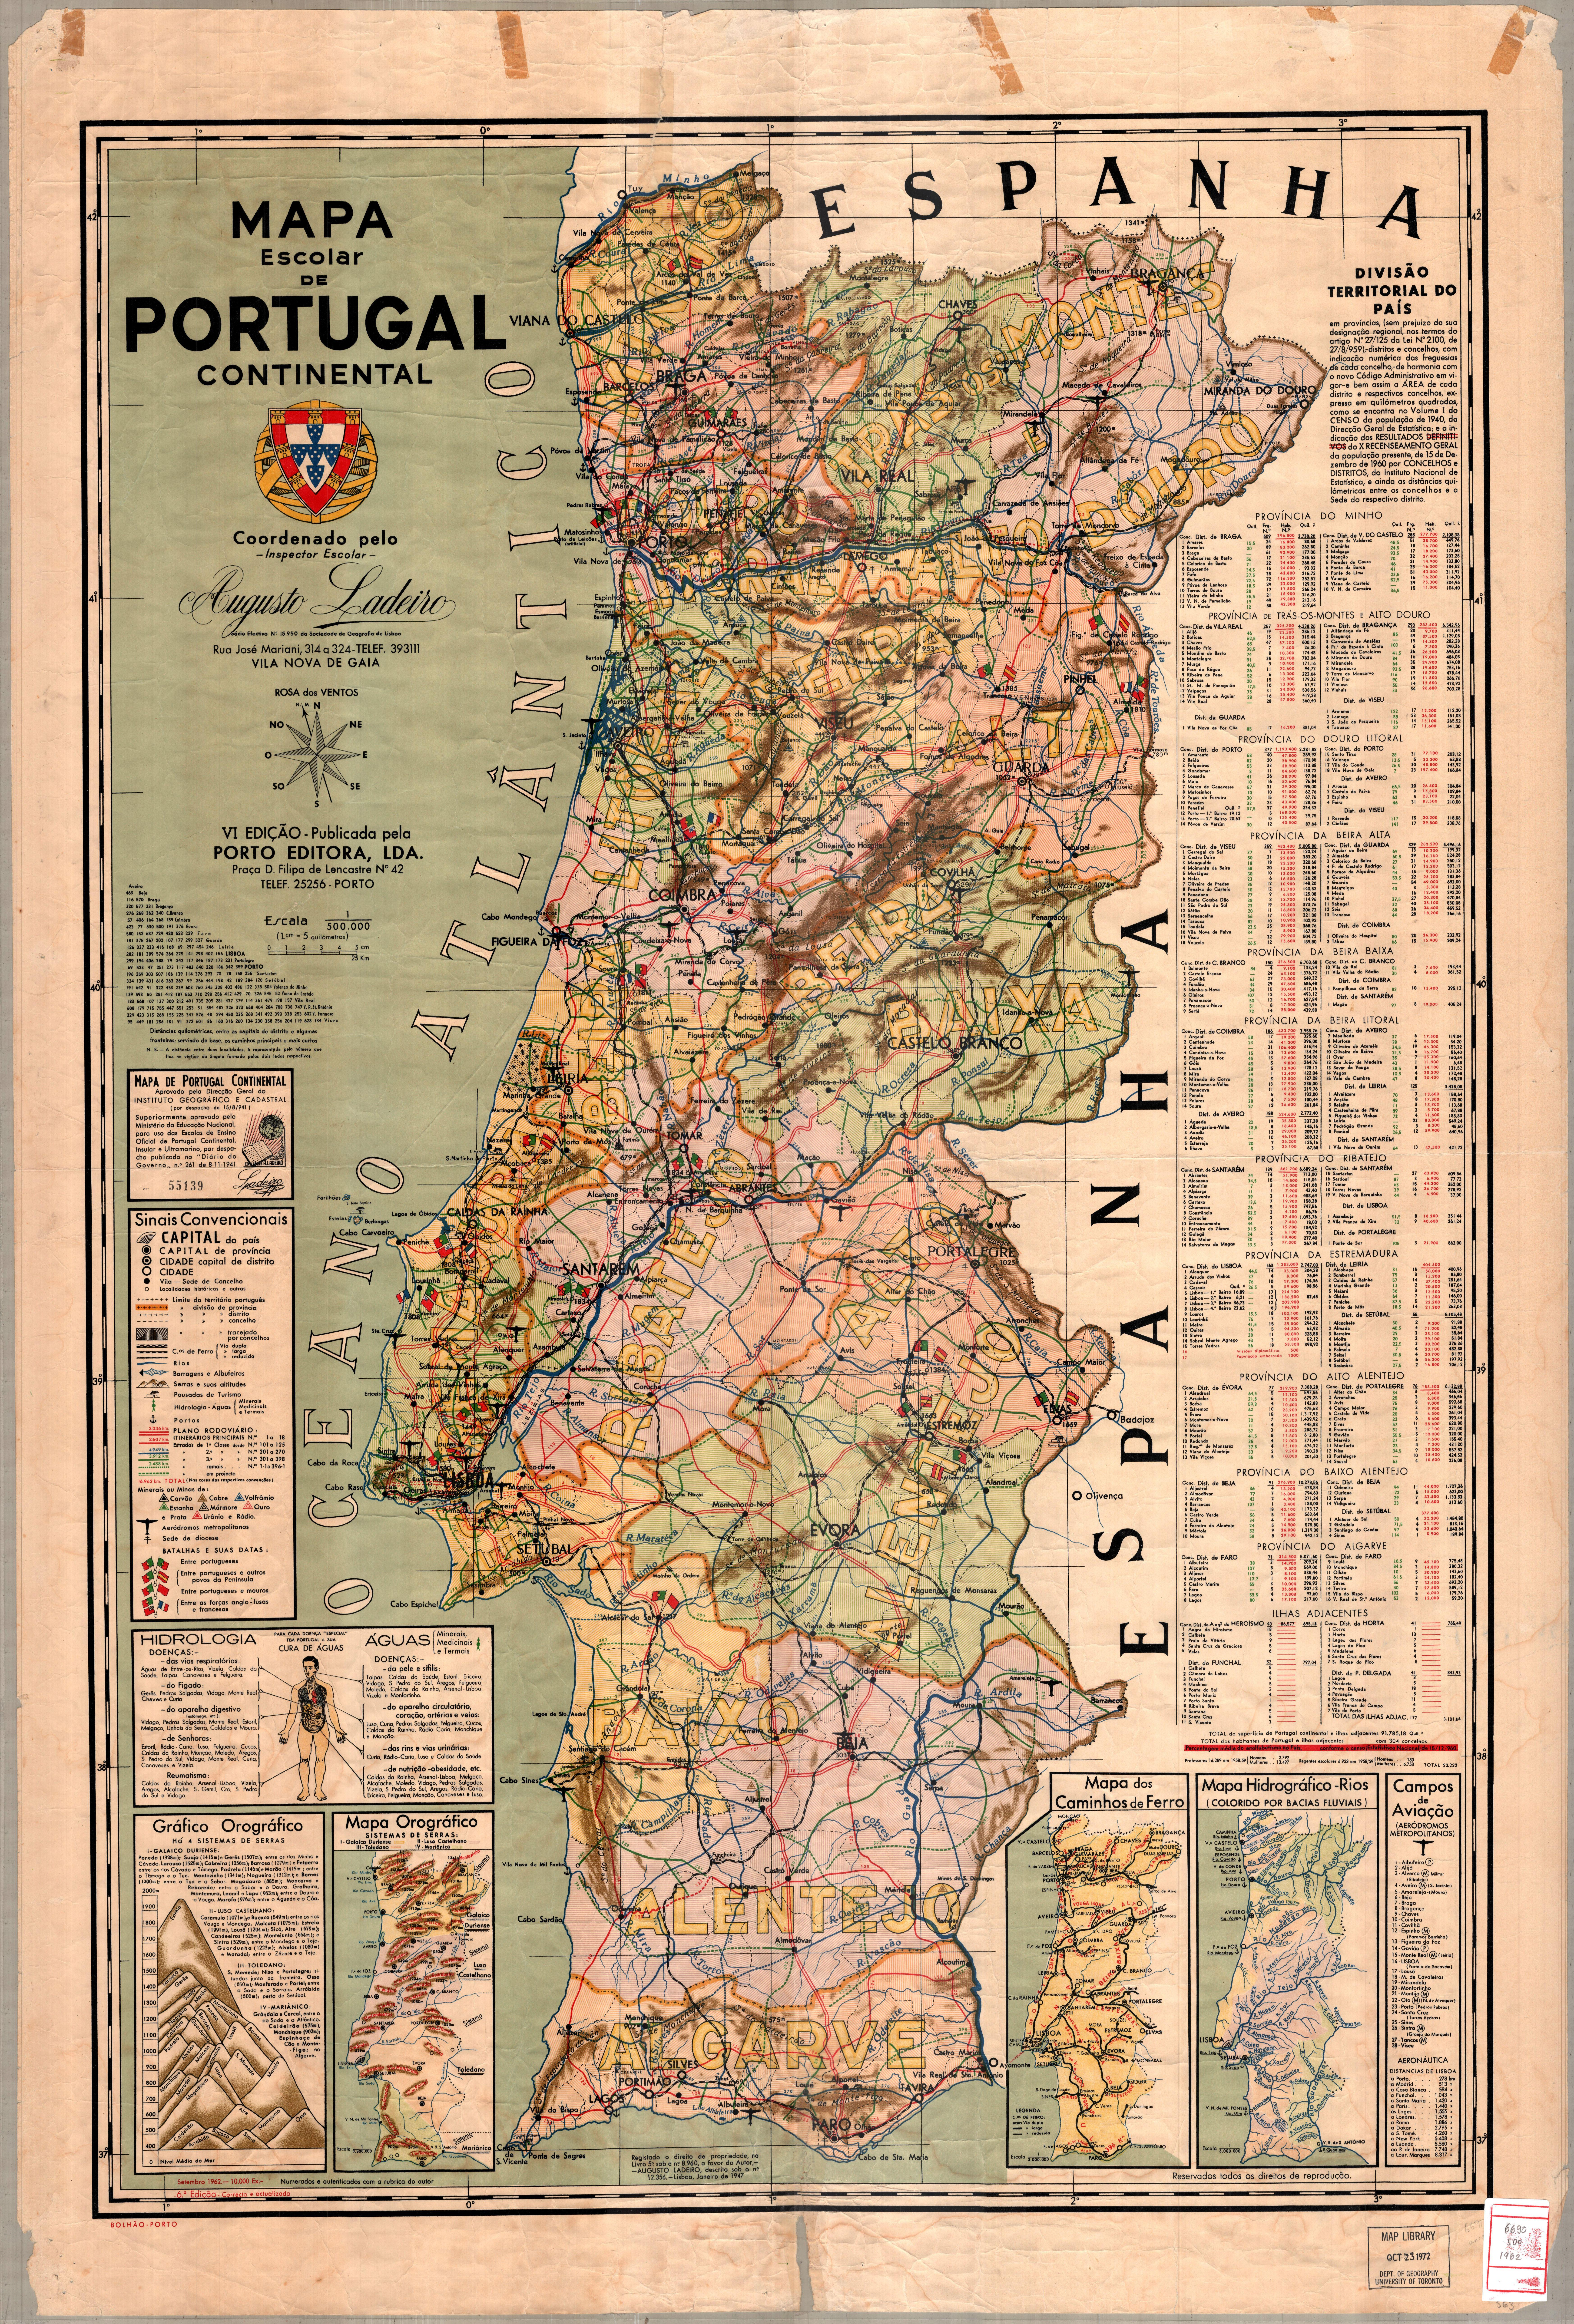 portugal mapa escolar porto editora mapa escolar Mapa escolar de Portugal continental [School map of Continental  portugal mapa escolar porto editora mapa escolar